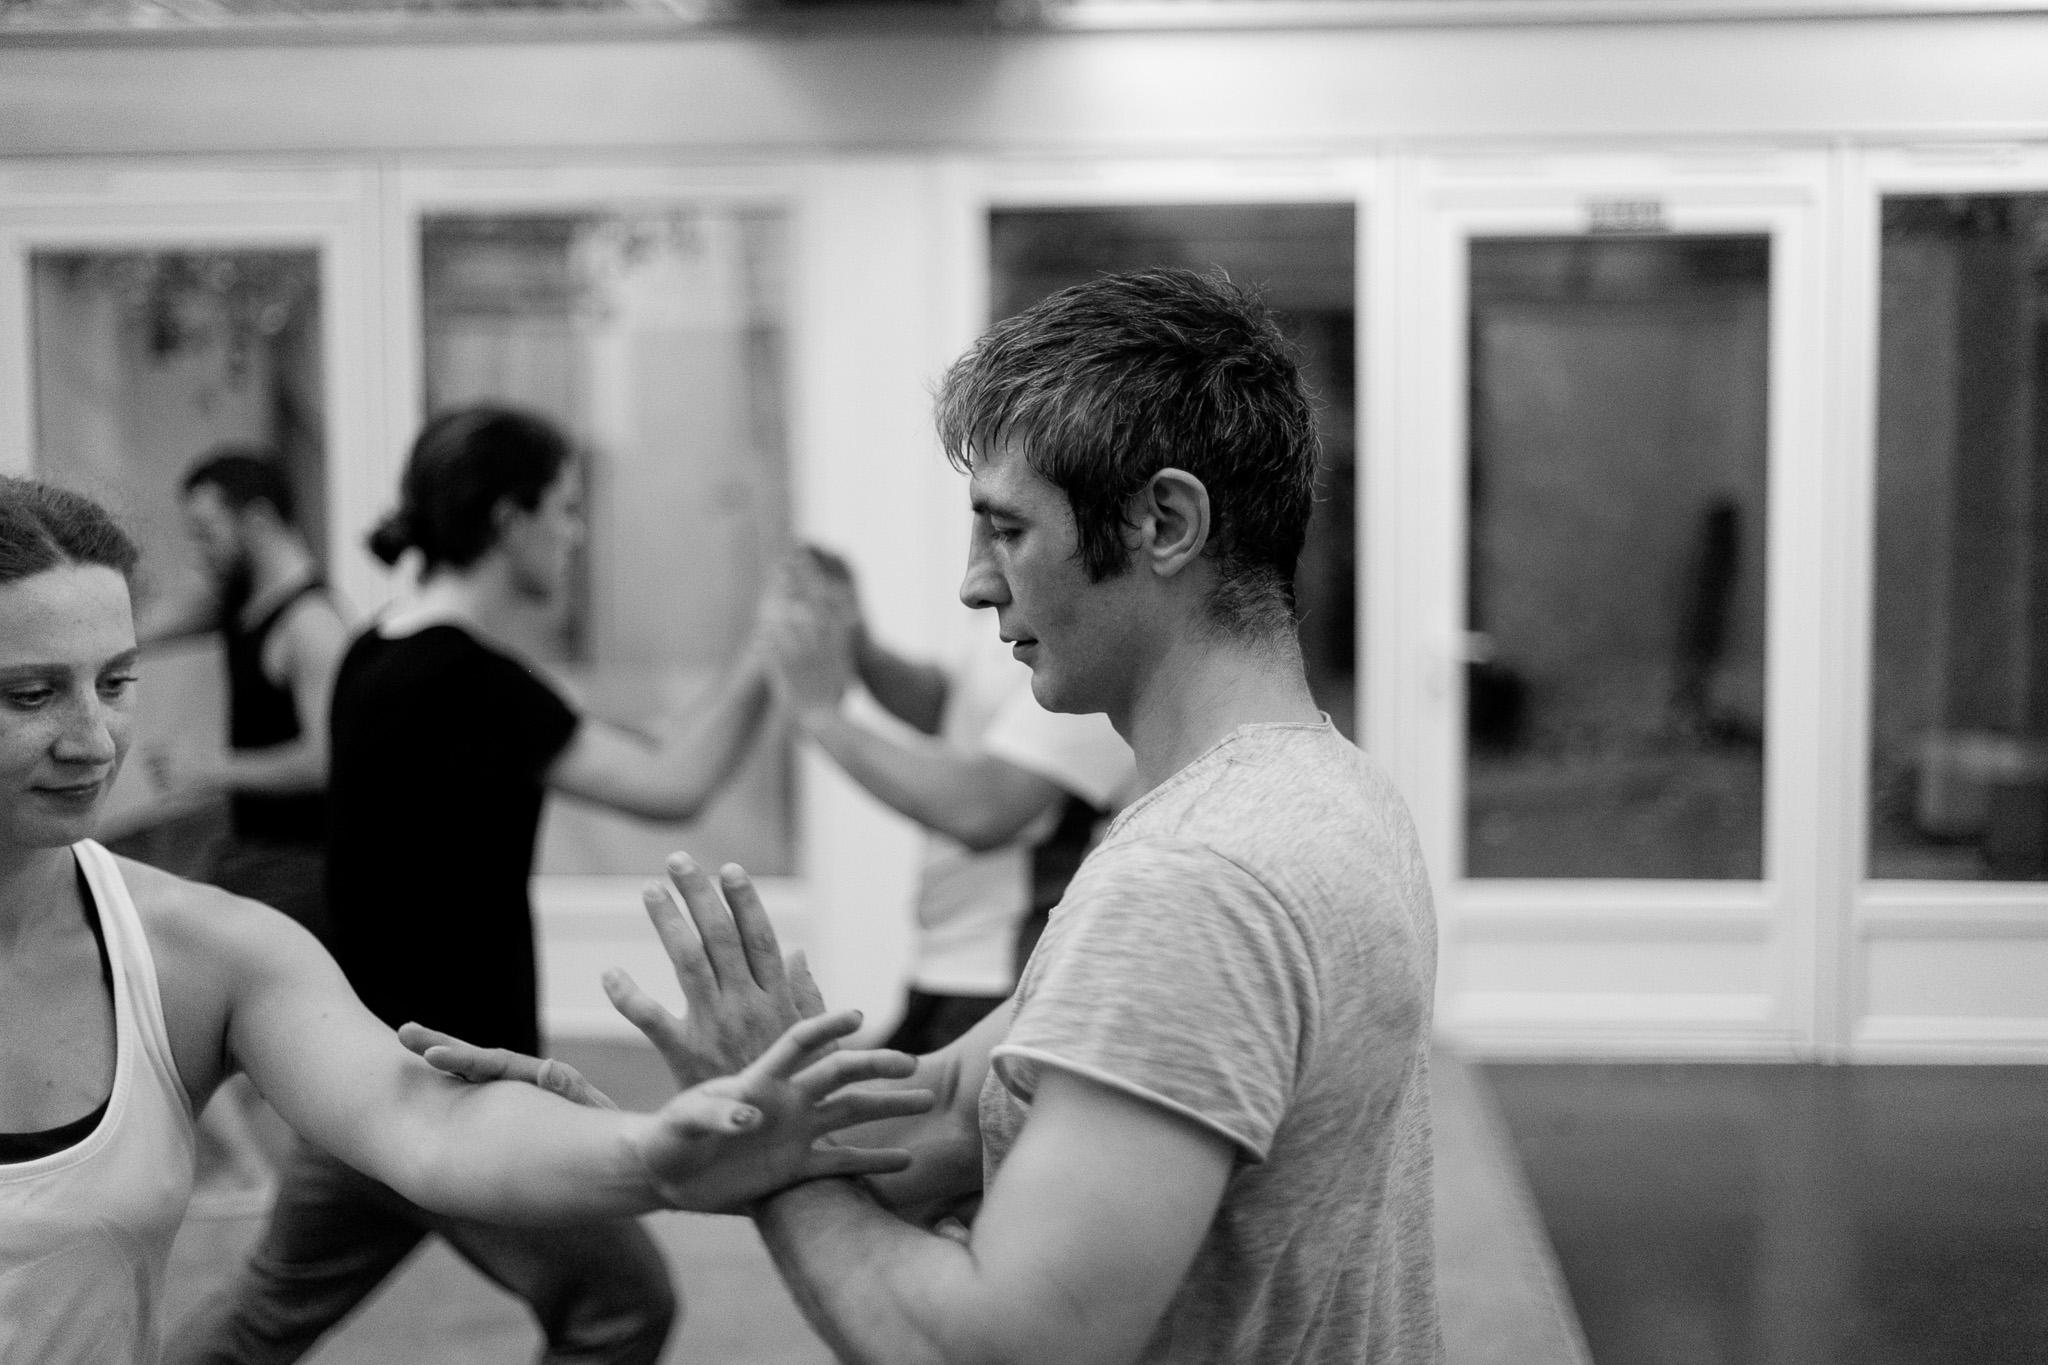 tai chi pushing hands practice